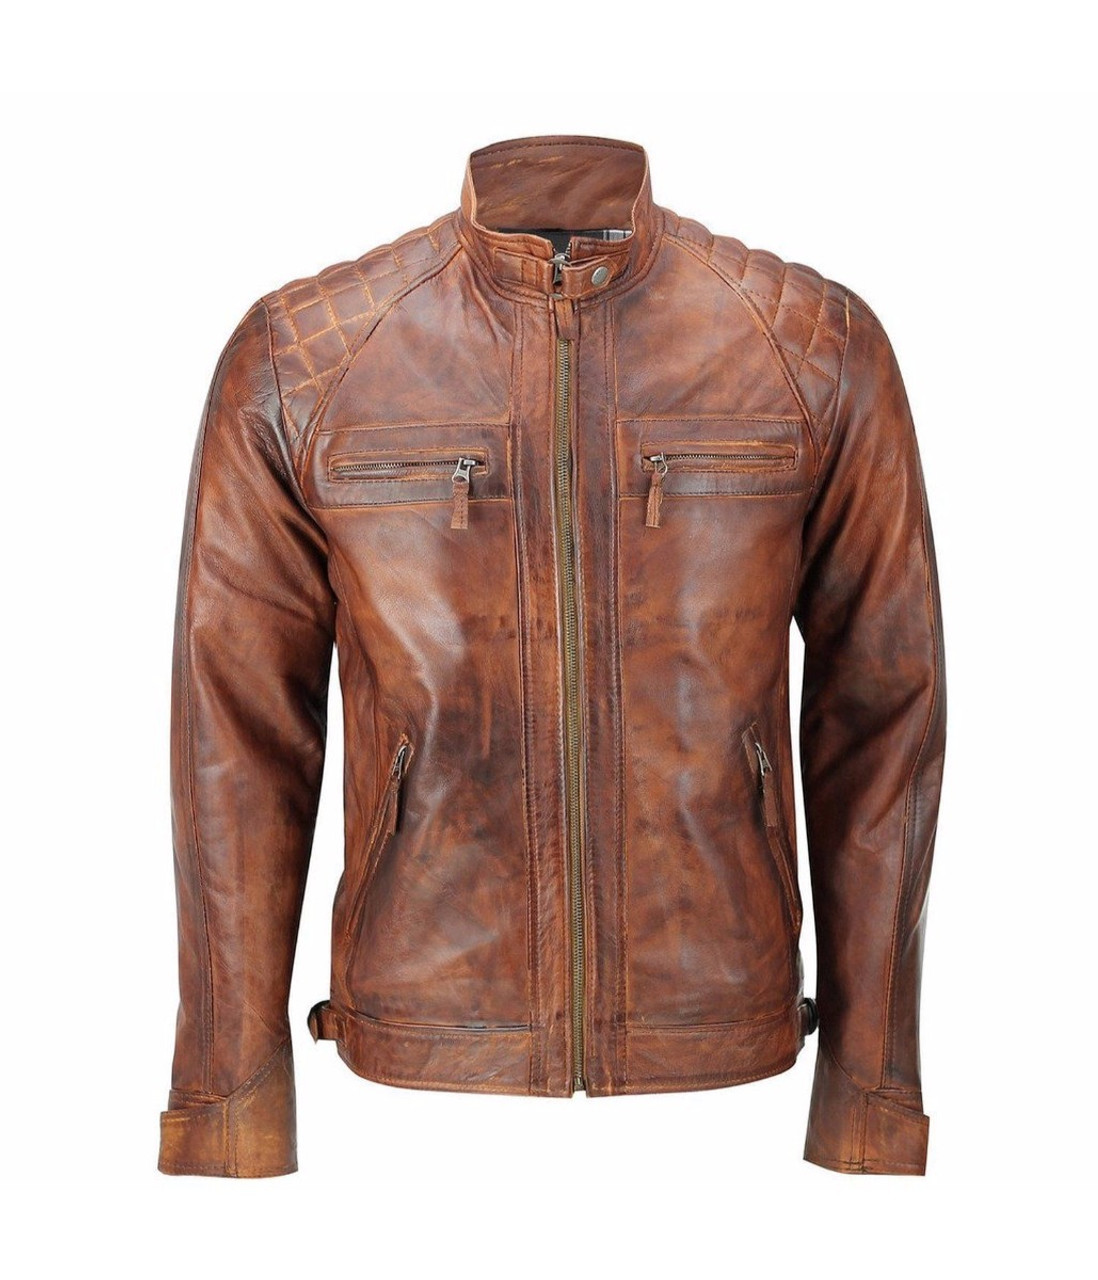 Mens Vintage Biker Style Brown Motorcycle Cafe Racer Distressed Leather Jacket